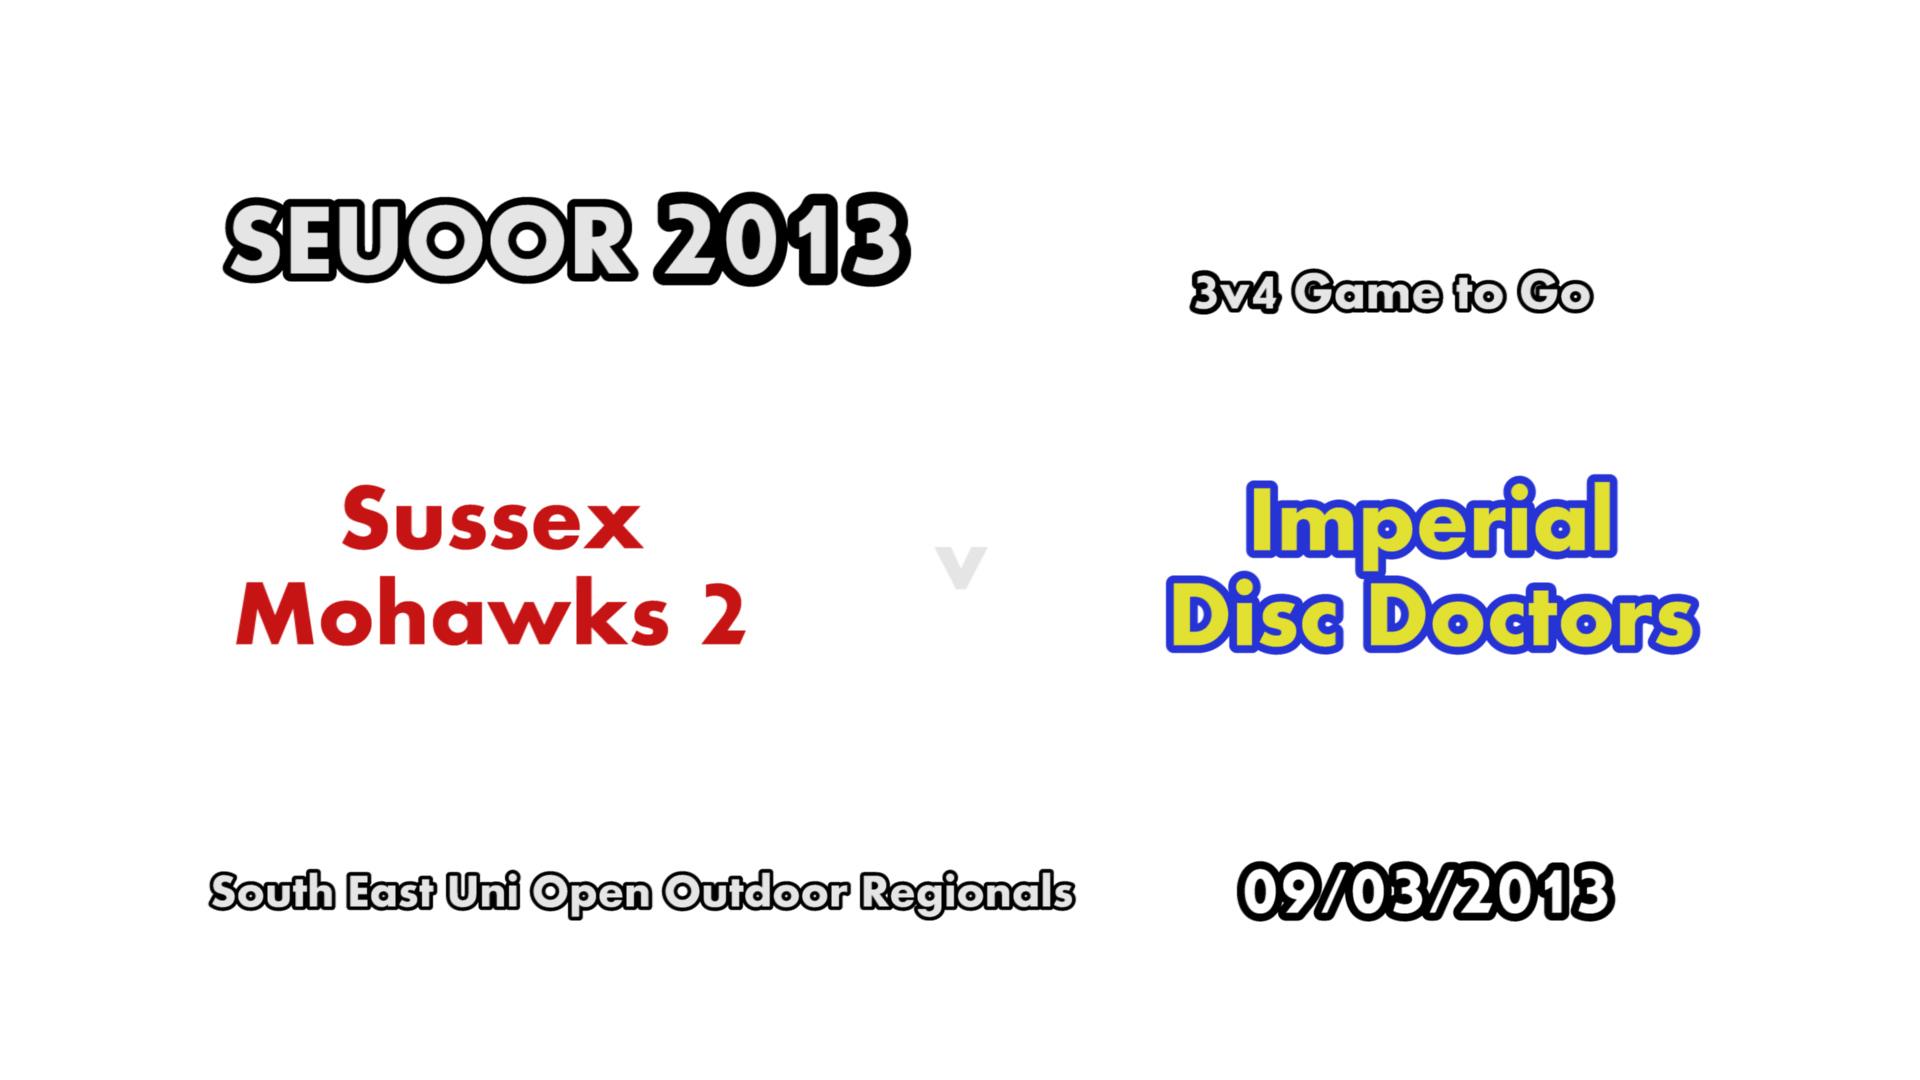 SEUOOR 2013 3v4: Mohawks 2 v Disc Doctors